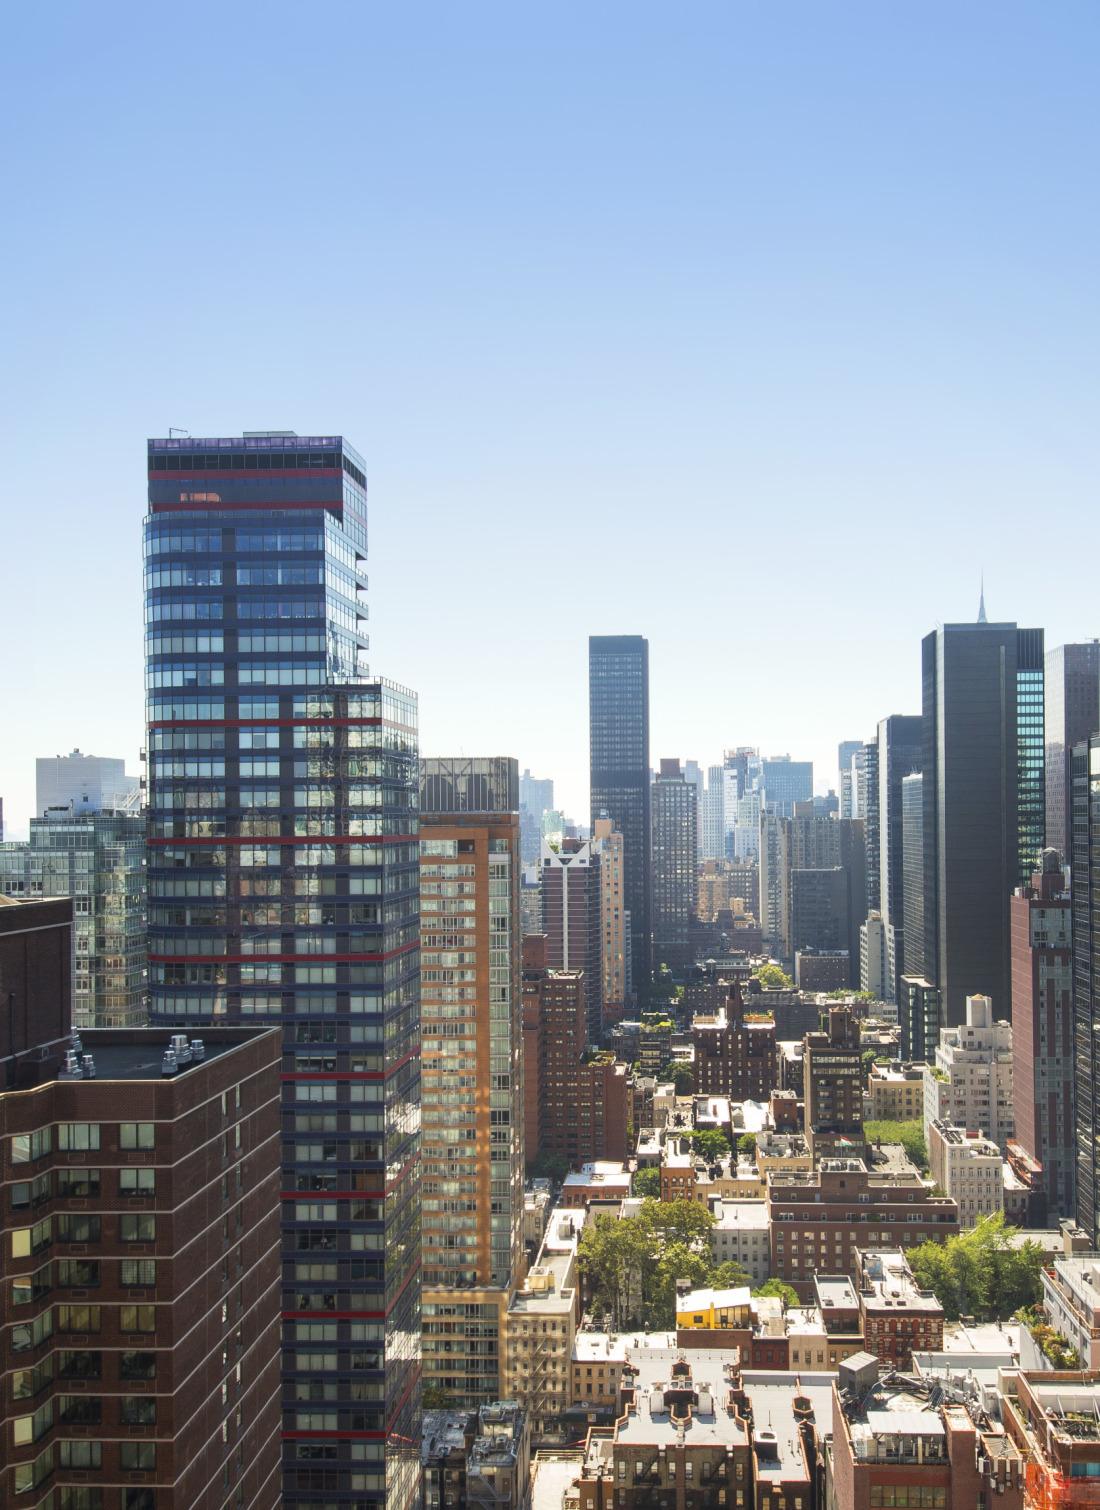 235 East 55th Street Midtown East New York NY 10022